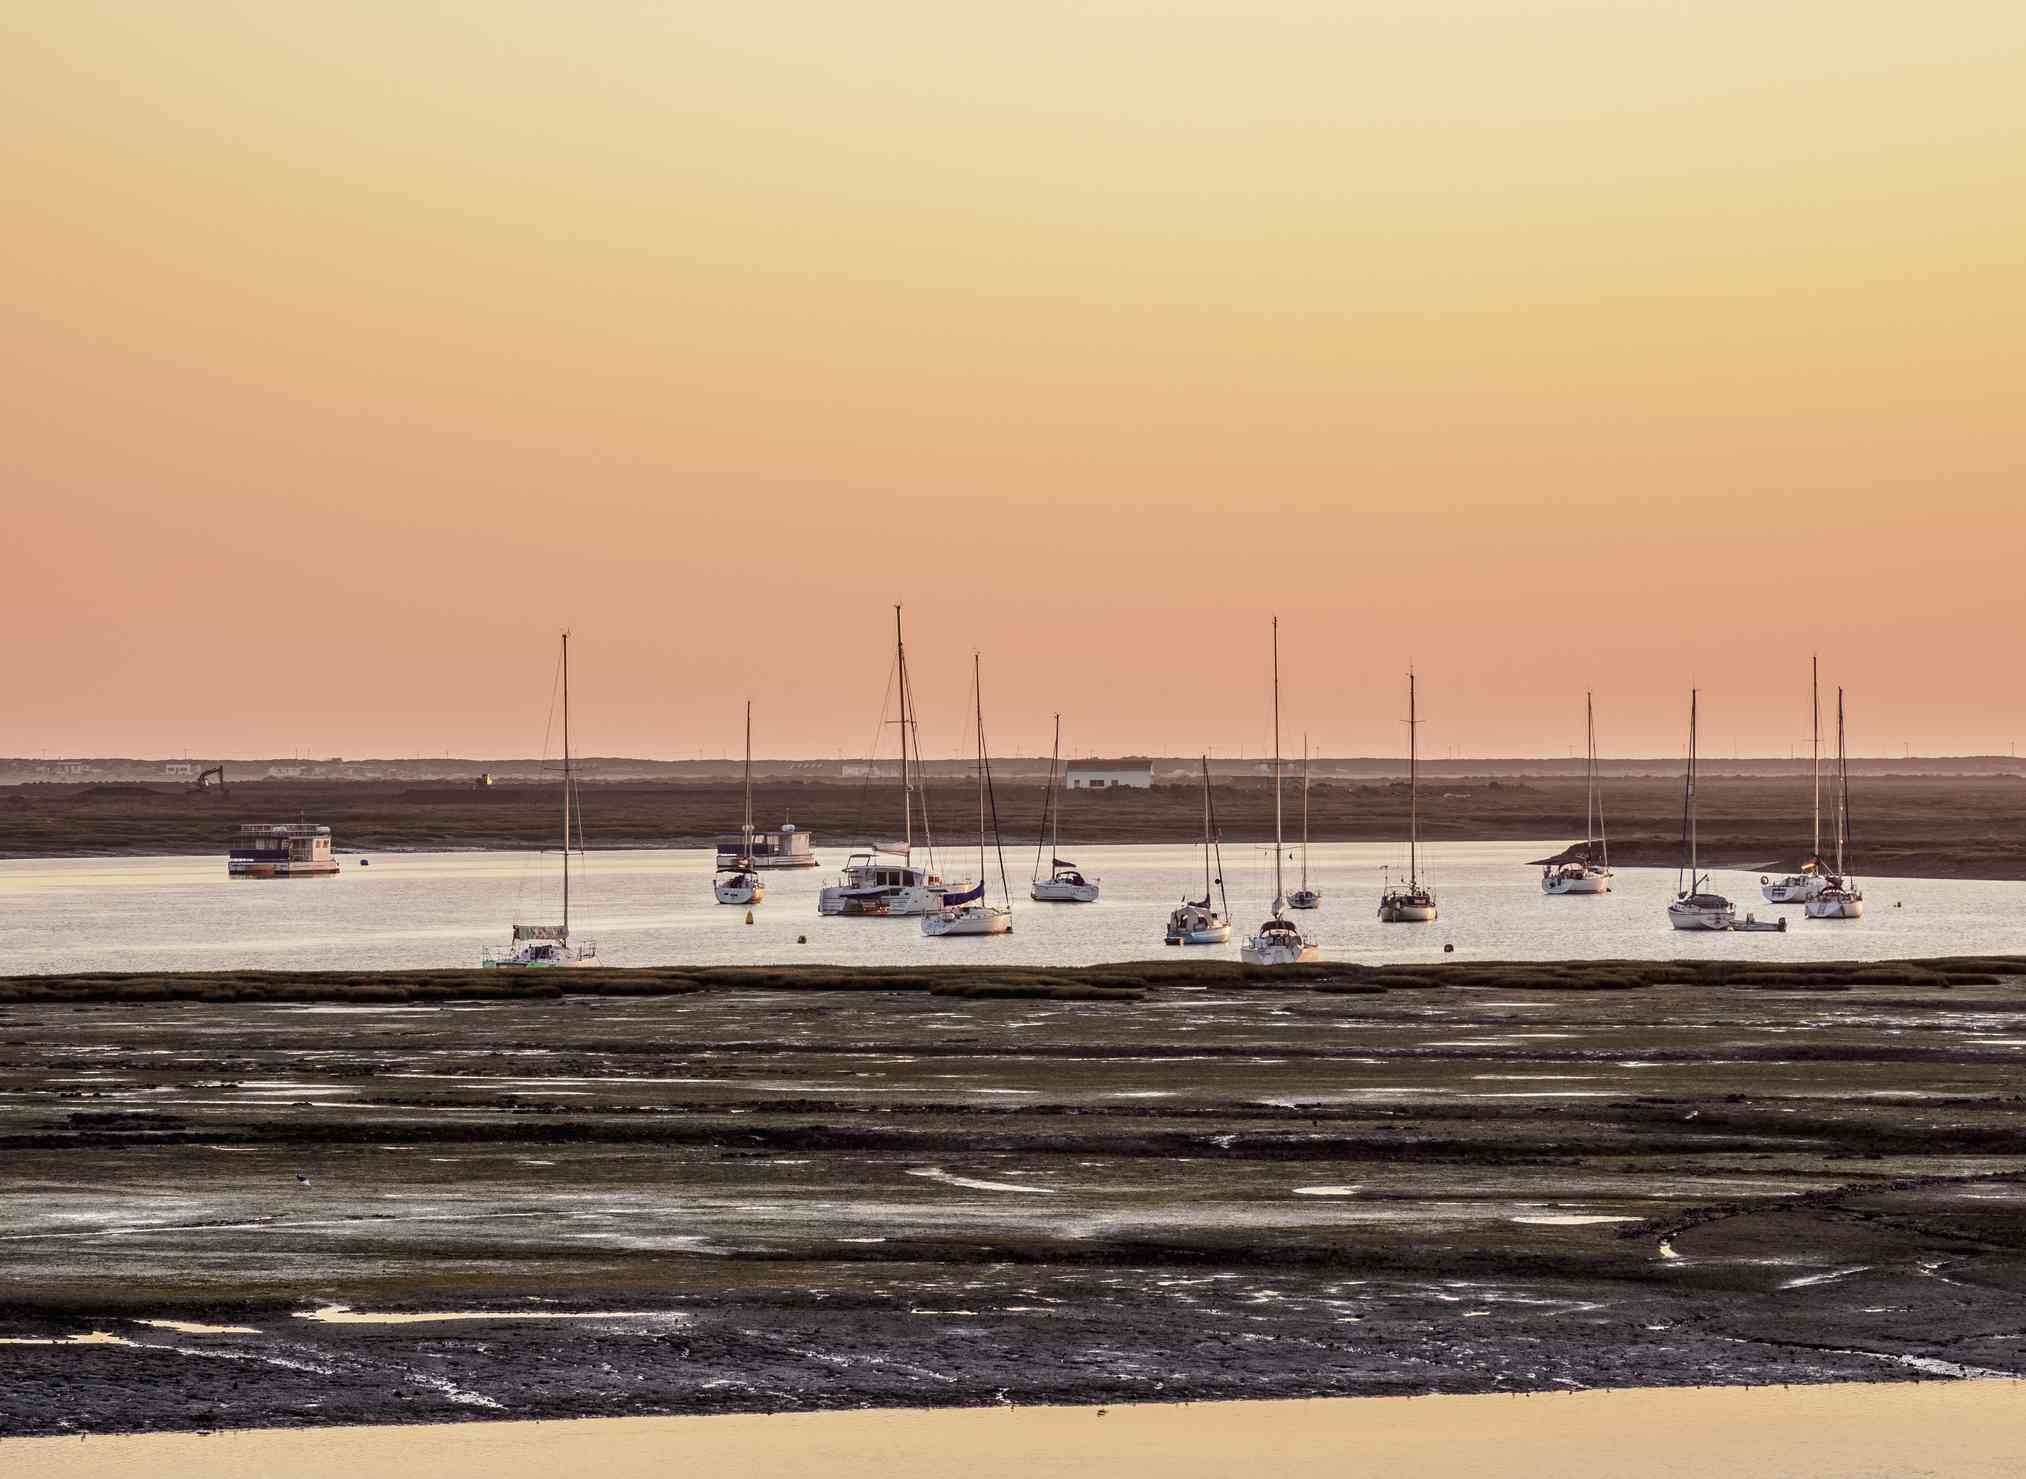 Sailboats Moored In Sea Against Orange Sky